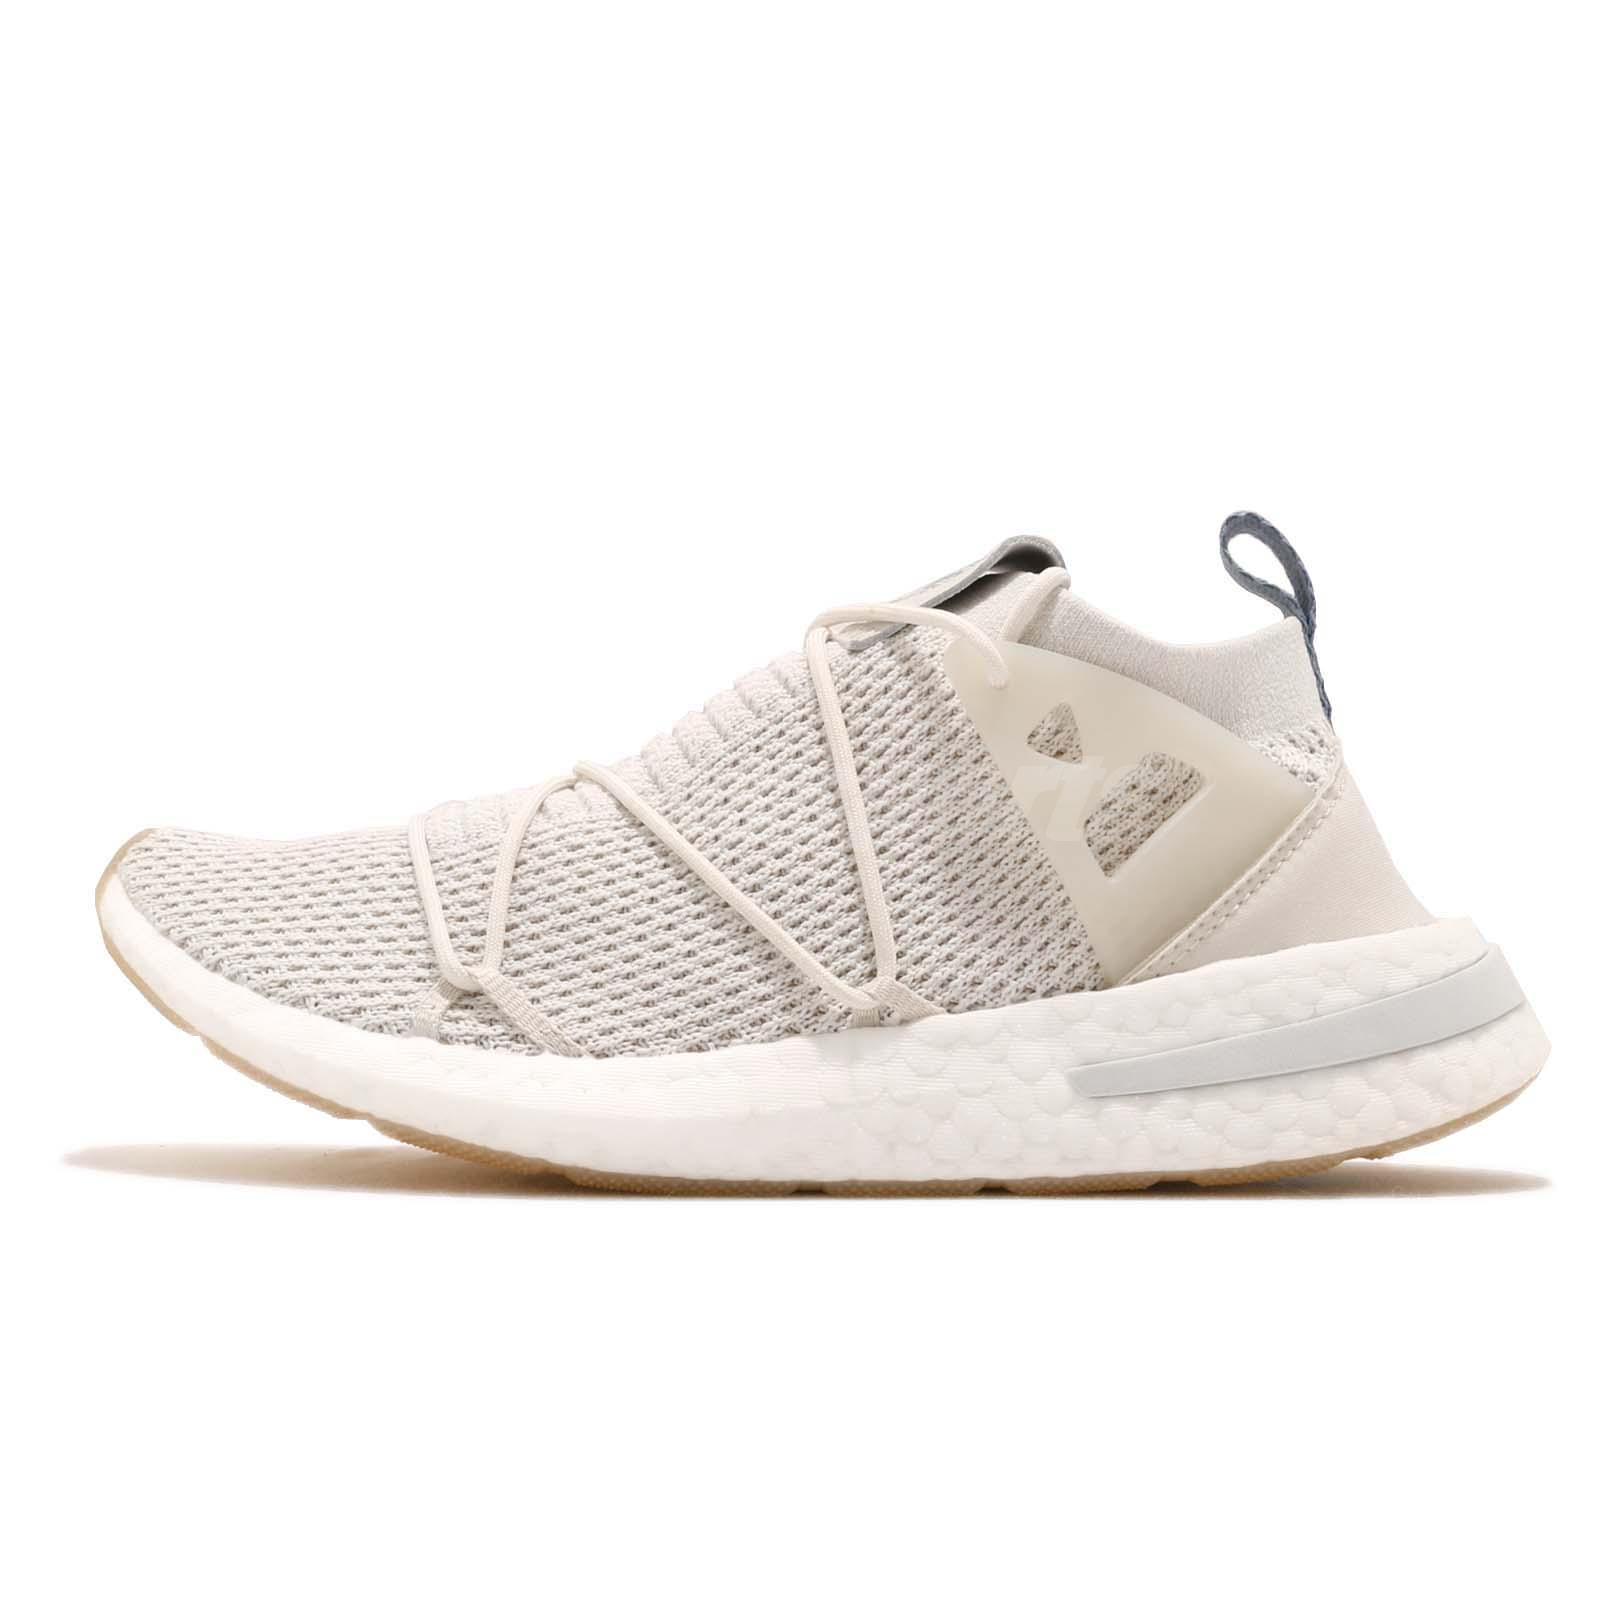 adidas Originals ARKYN PK W Primeknit Boost Talc Linen Women Running Shoe  B96509 33a5efd1f